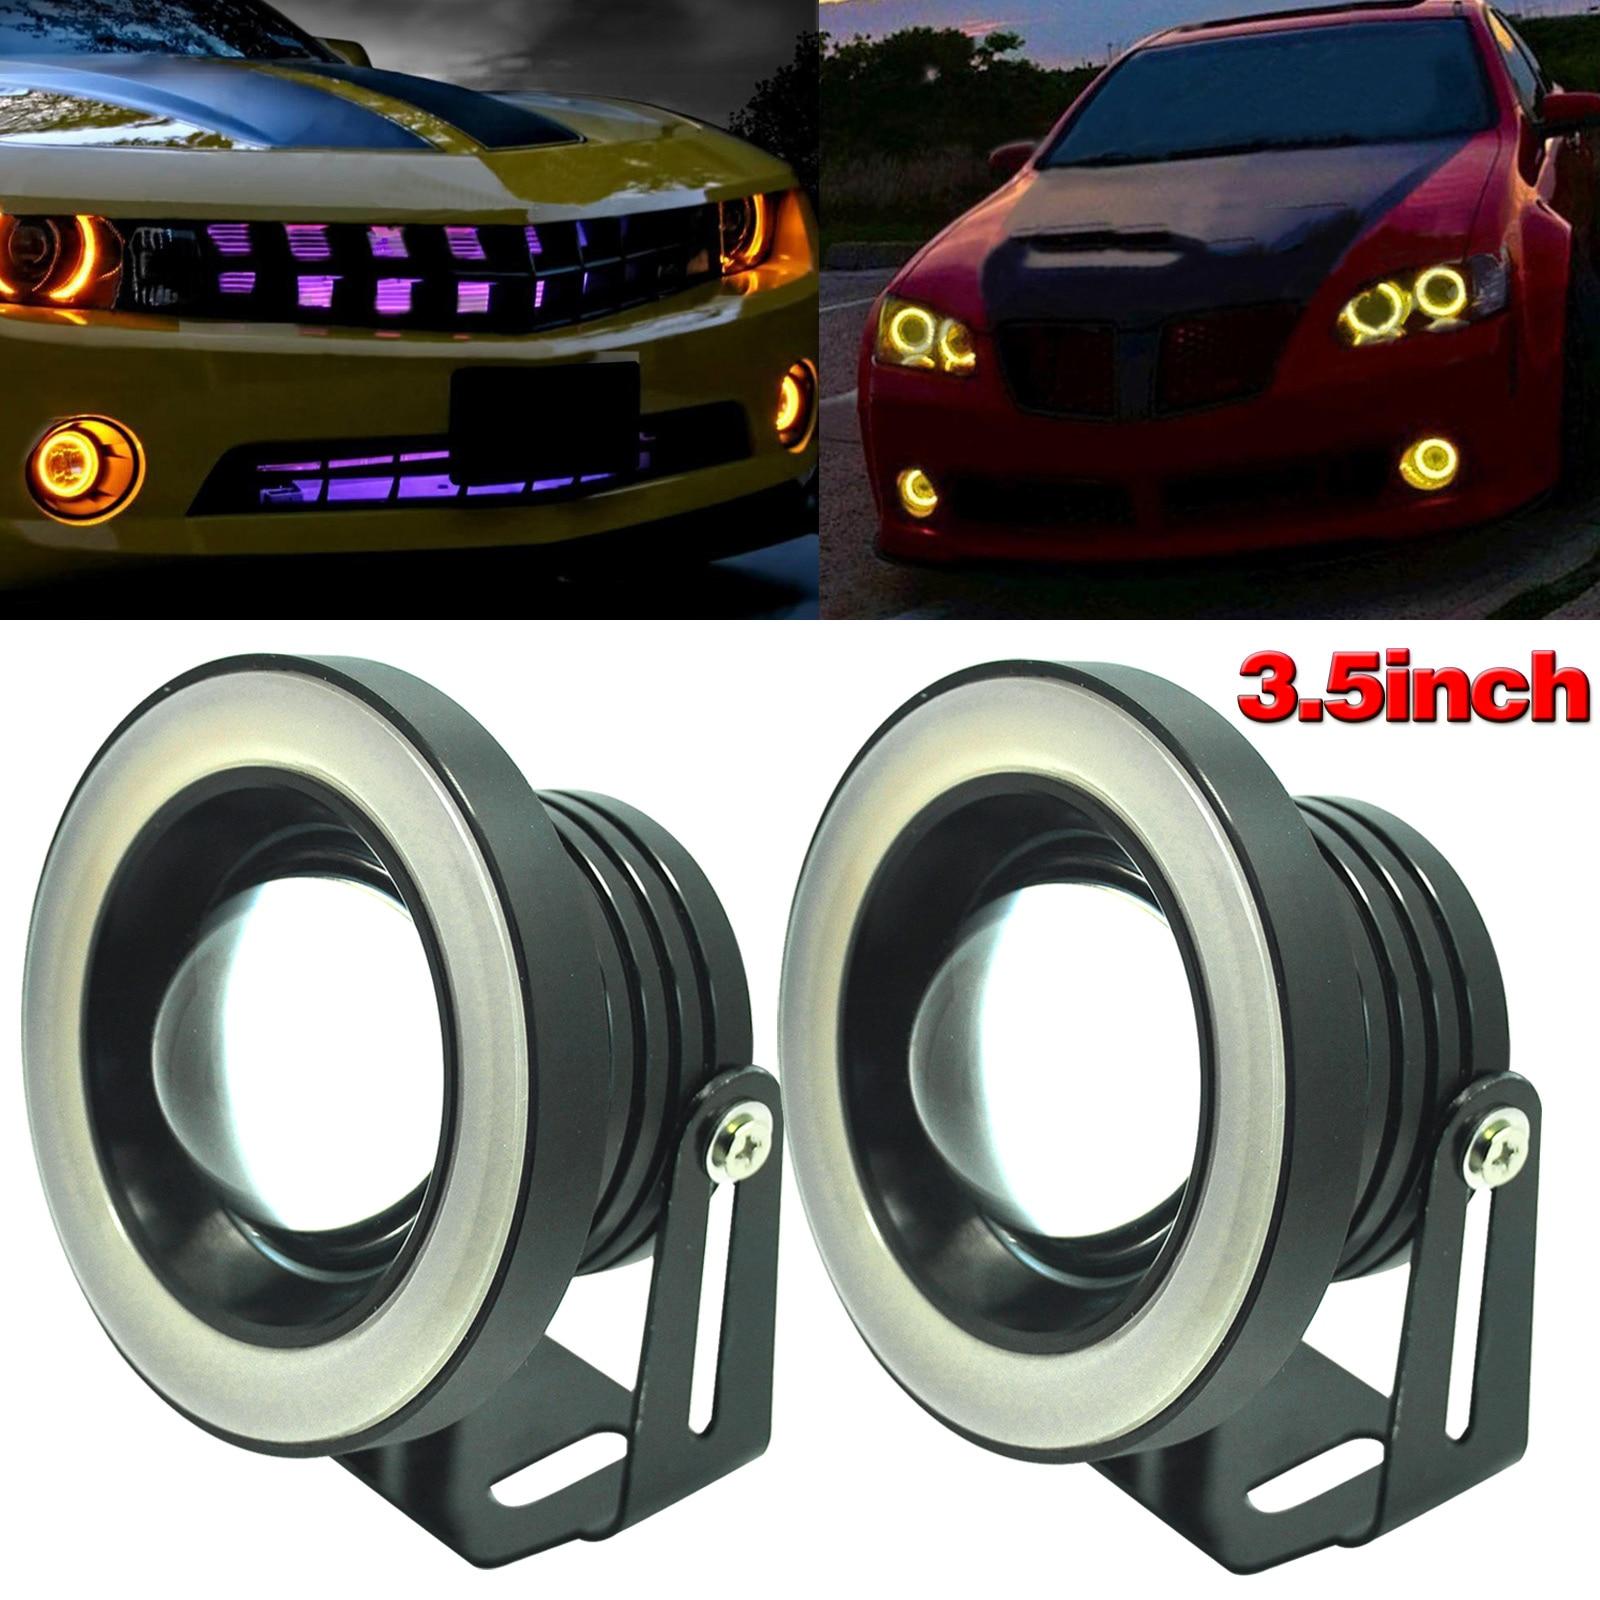 1pair 3.5inch Car COB LED Fog Driving Light Projector Tube Halo Angel Eyes DRL Bulbs M8617